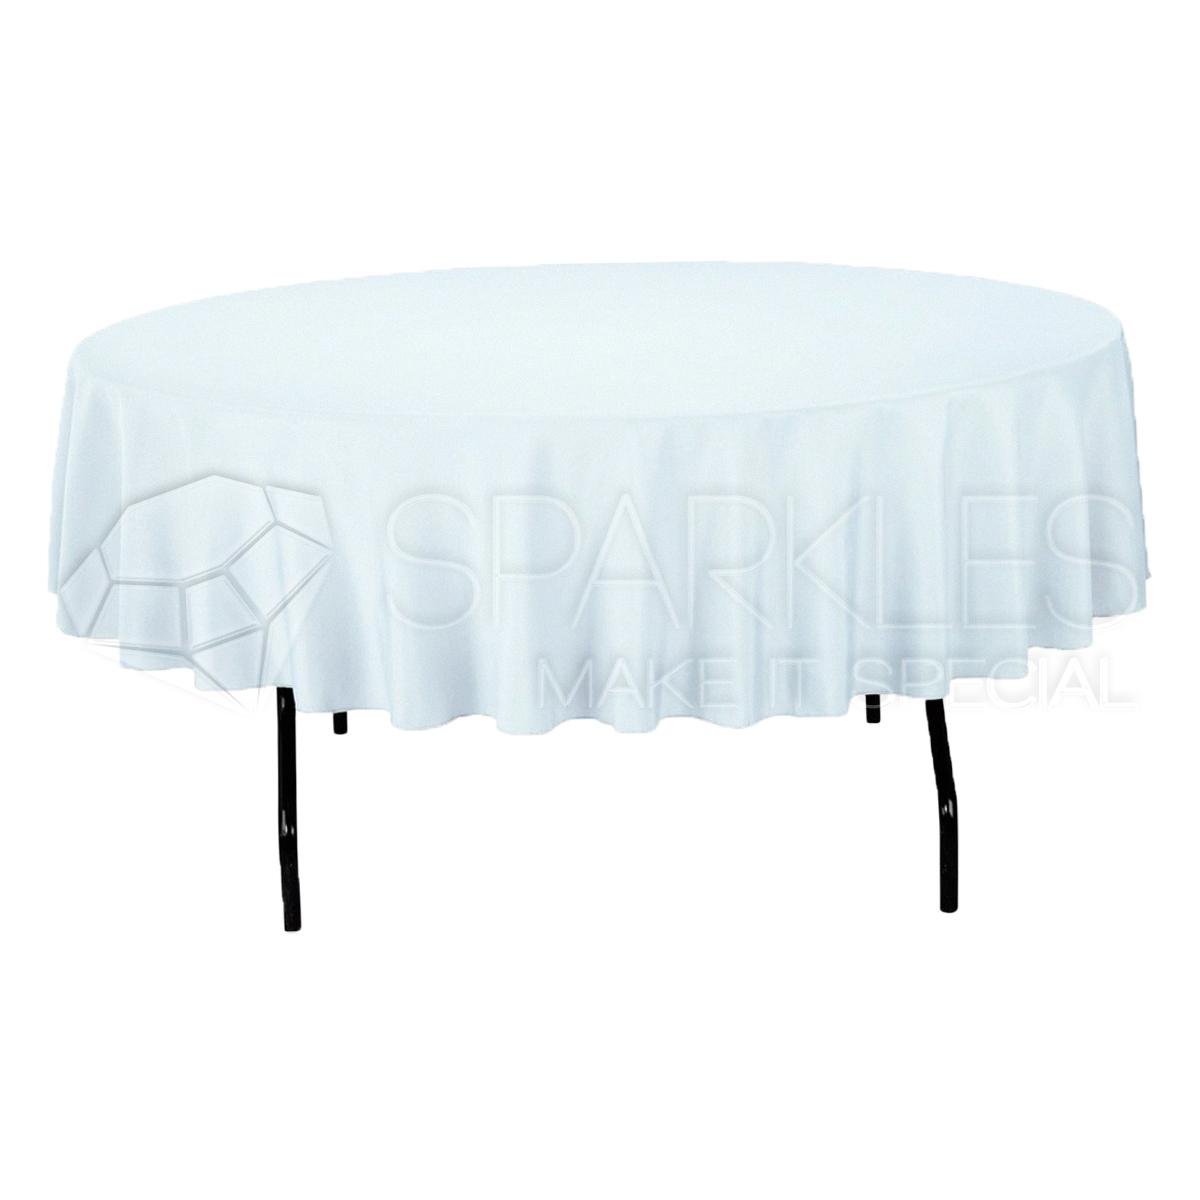 1 pc 90 round cloth fabric linen tablecloth white wedding restaurant hz ebay. Black Bedroom Furniture Sets. Home Design Ideas